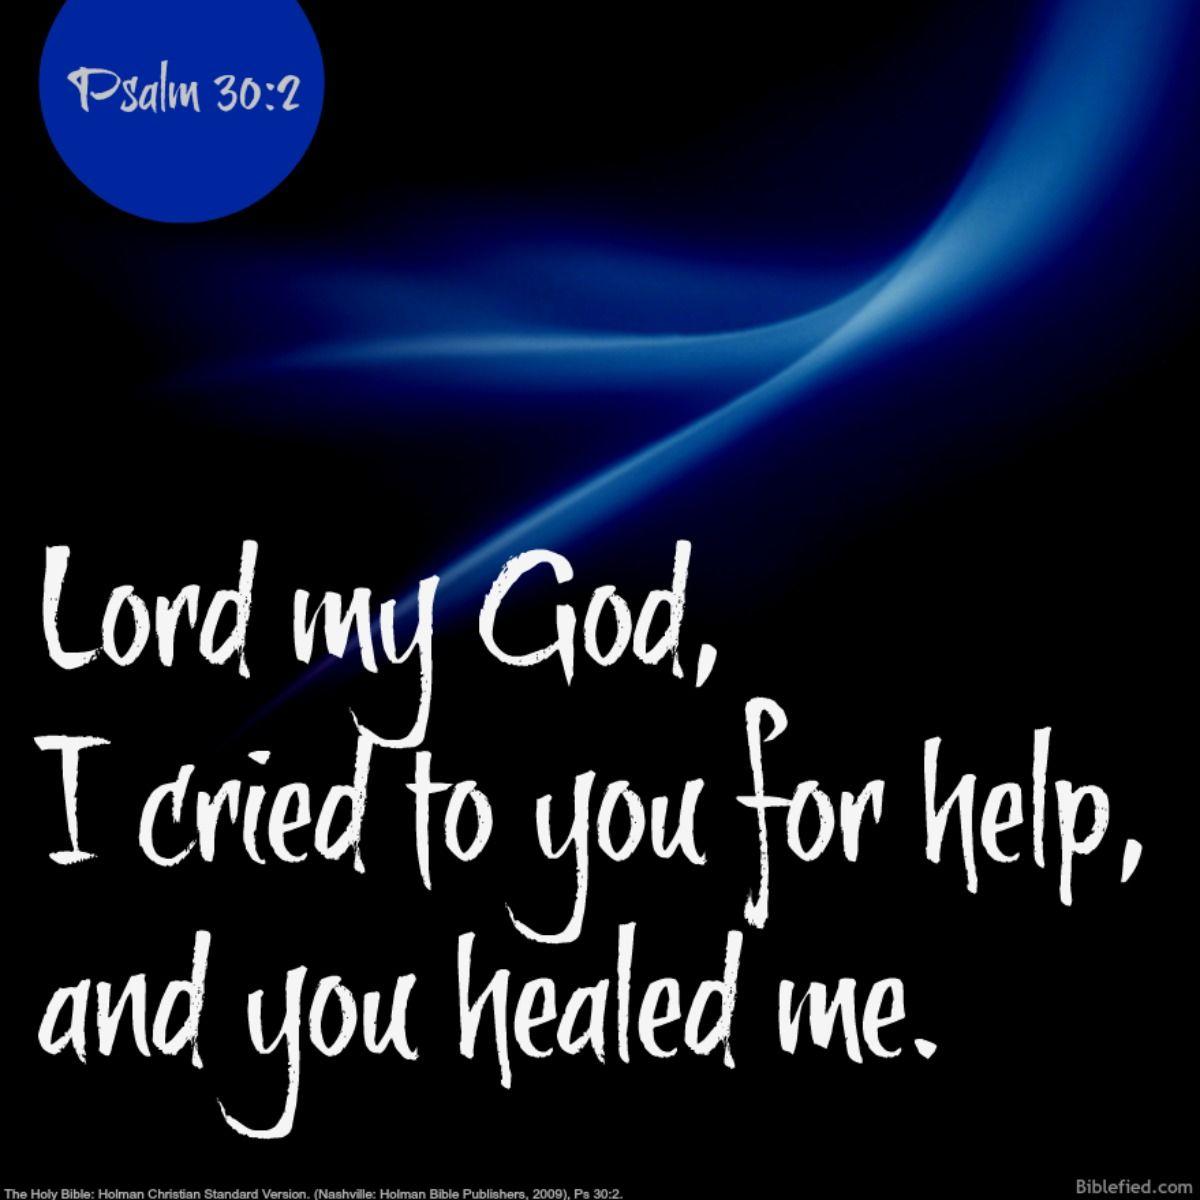 Psalm 30:2 | Bible study lessons, Bible study, Bible study tools